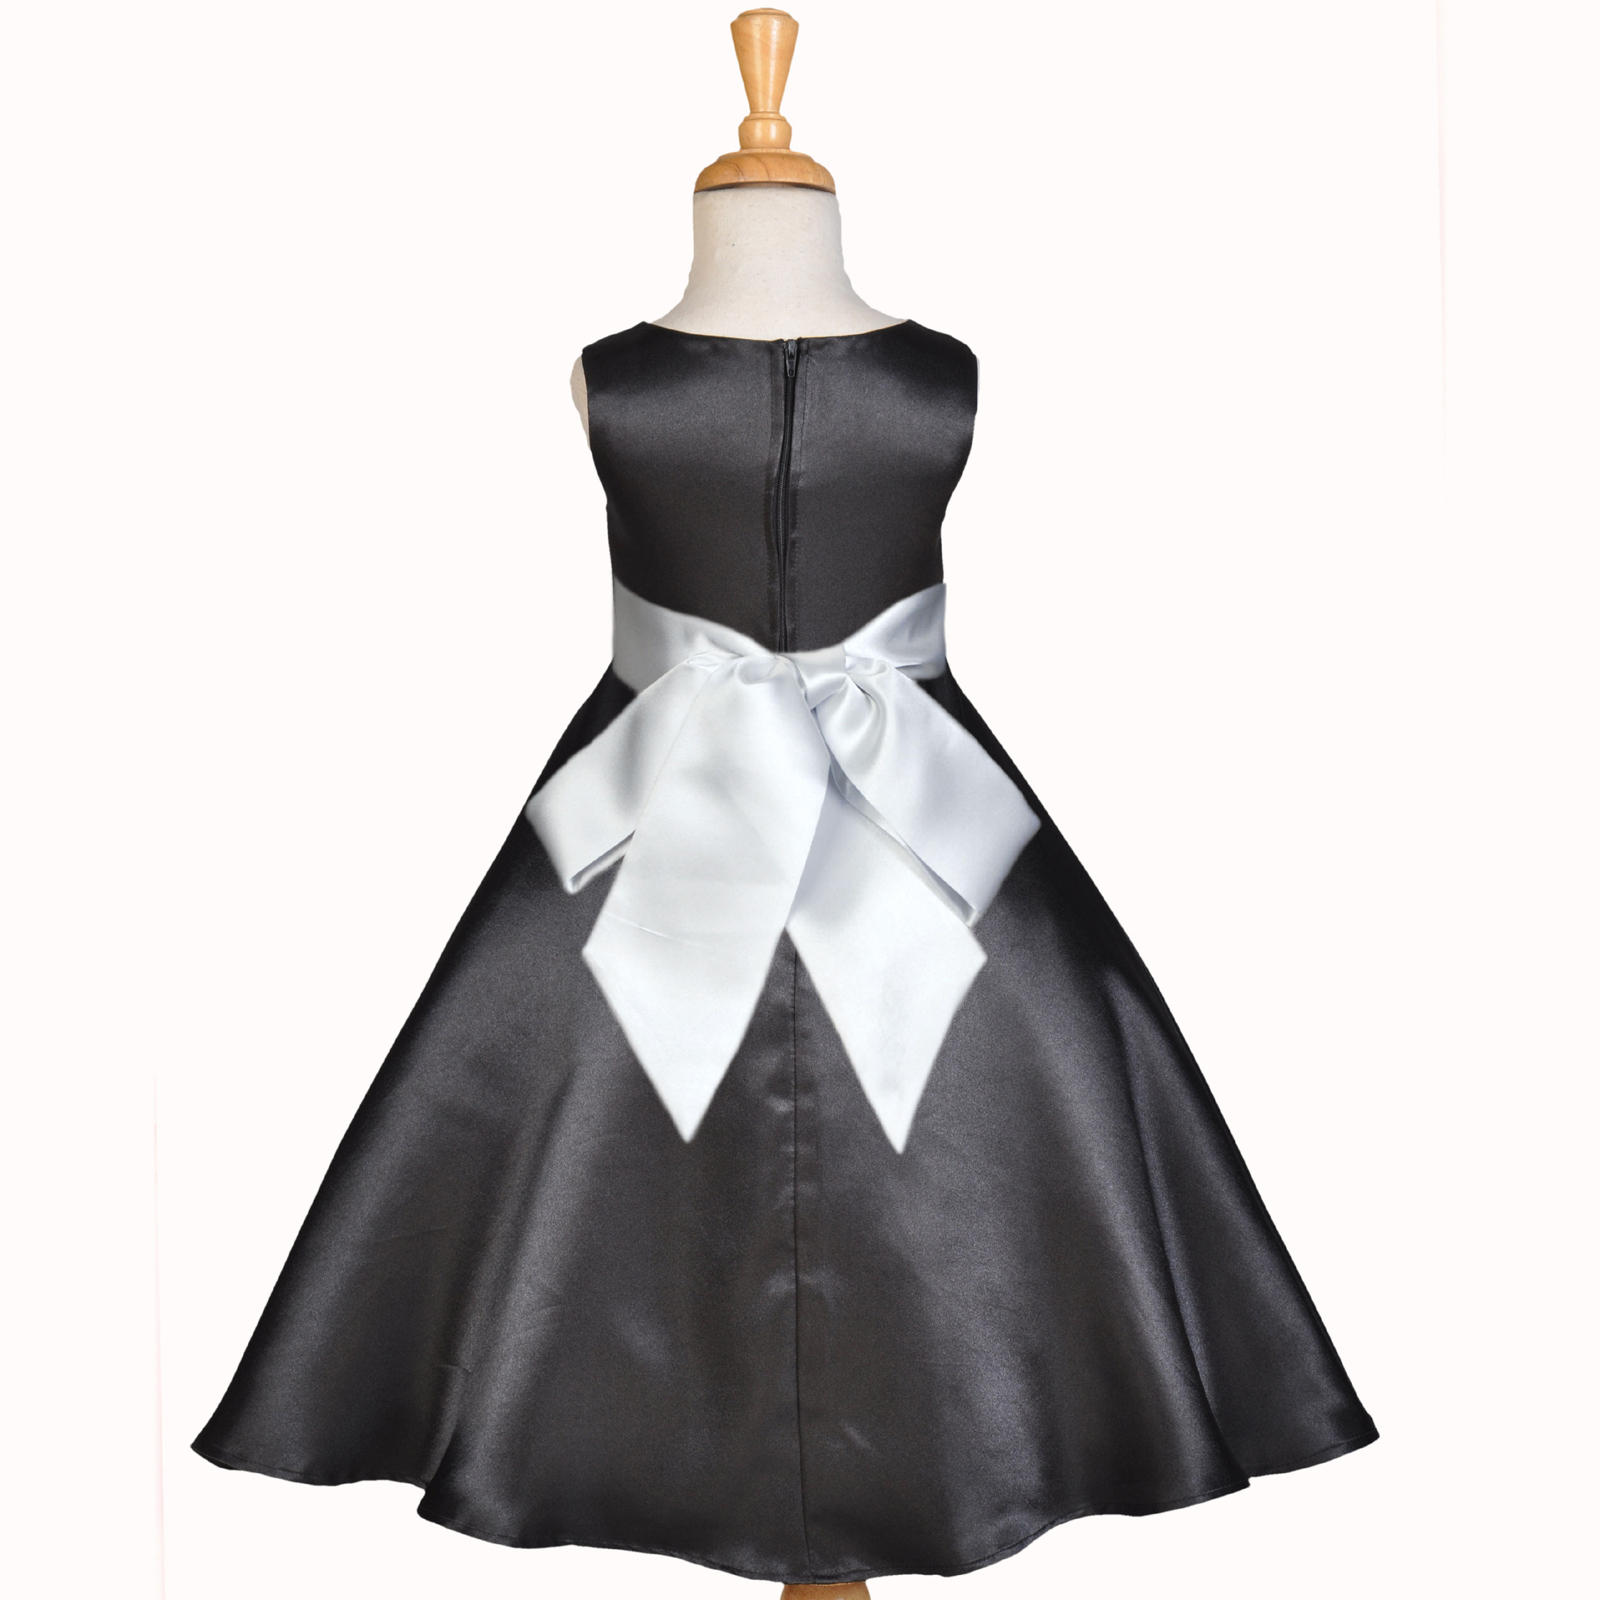 Black A-Line Satin Flower Girl Dress Pageant Wedding Bride Recital Toddler 821s